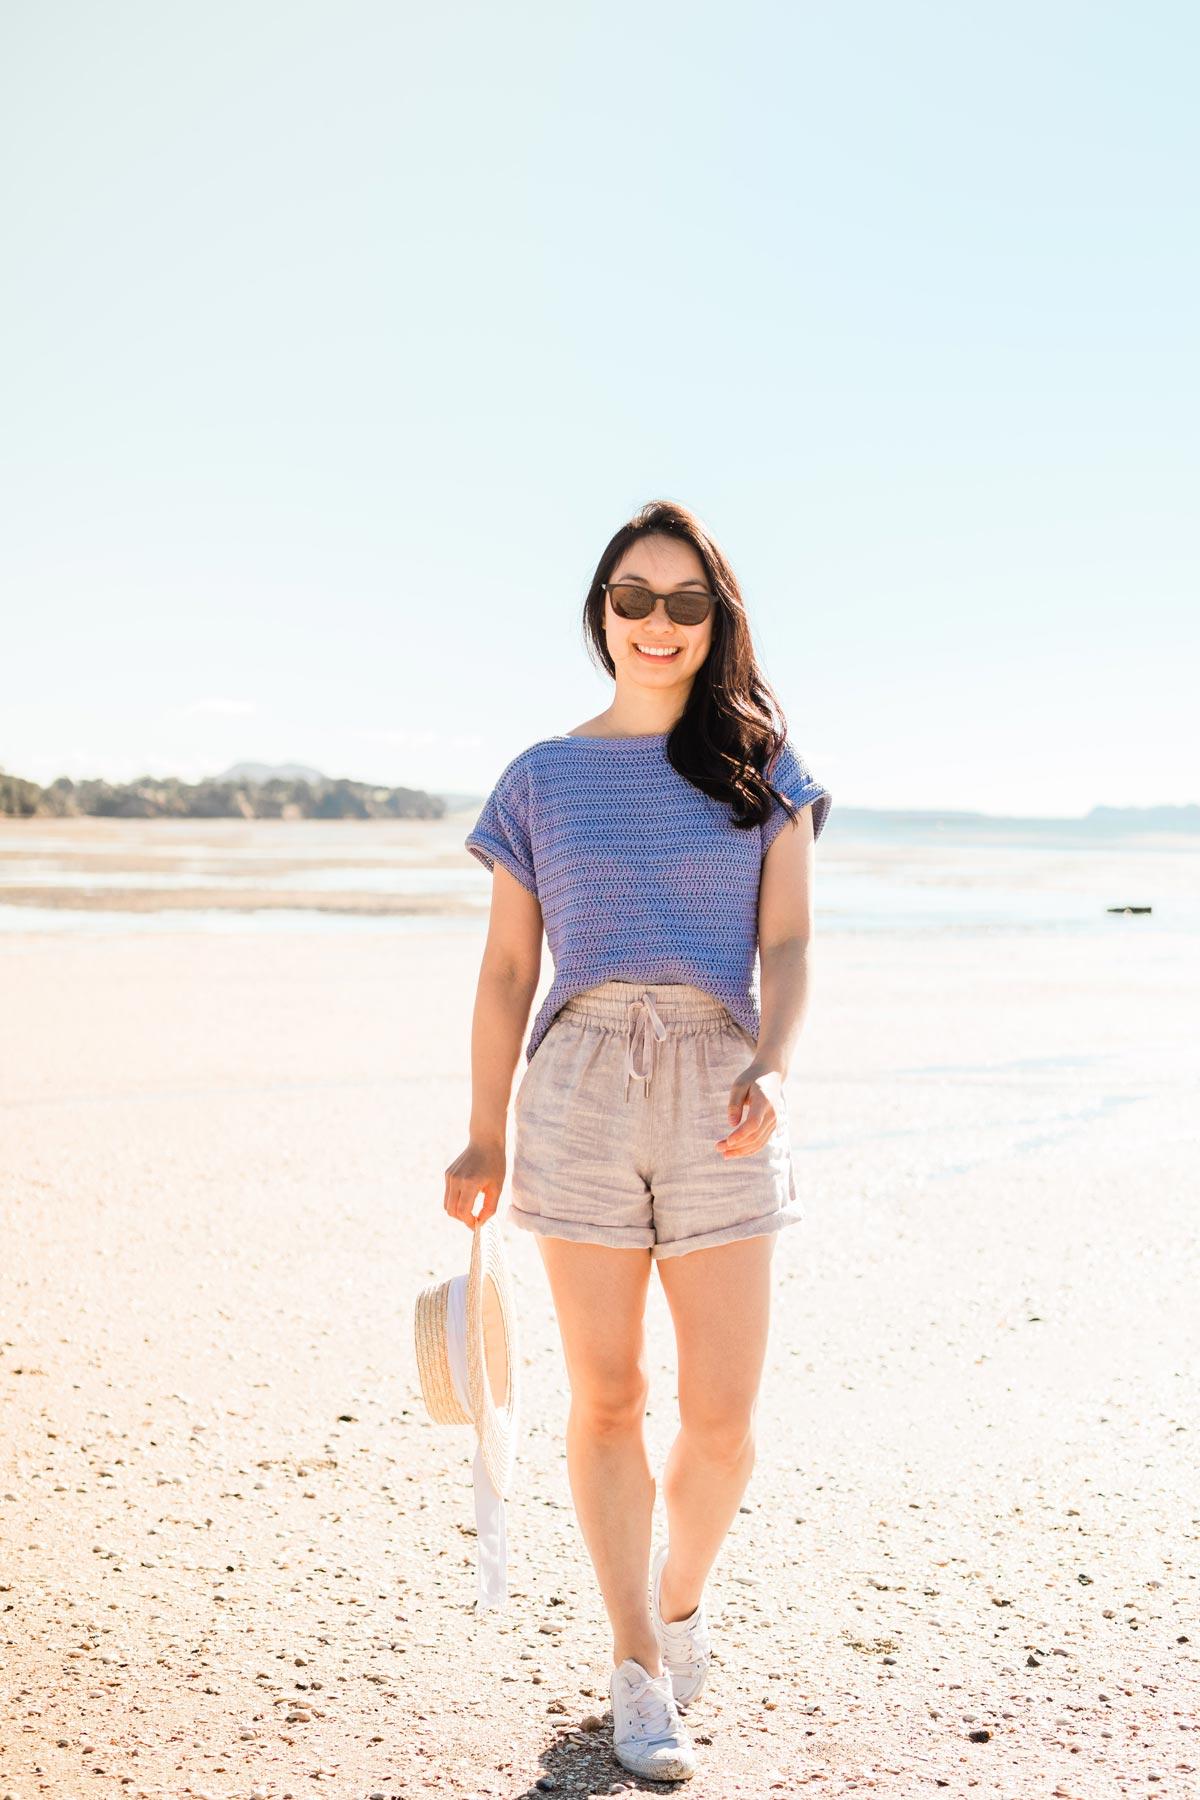 woman walking on beach wearing lilac cotton crochet t-shirt holding straw hat